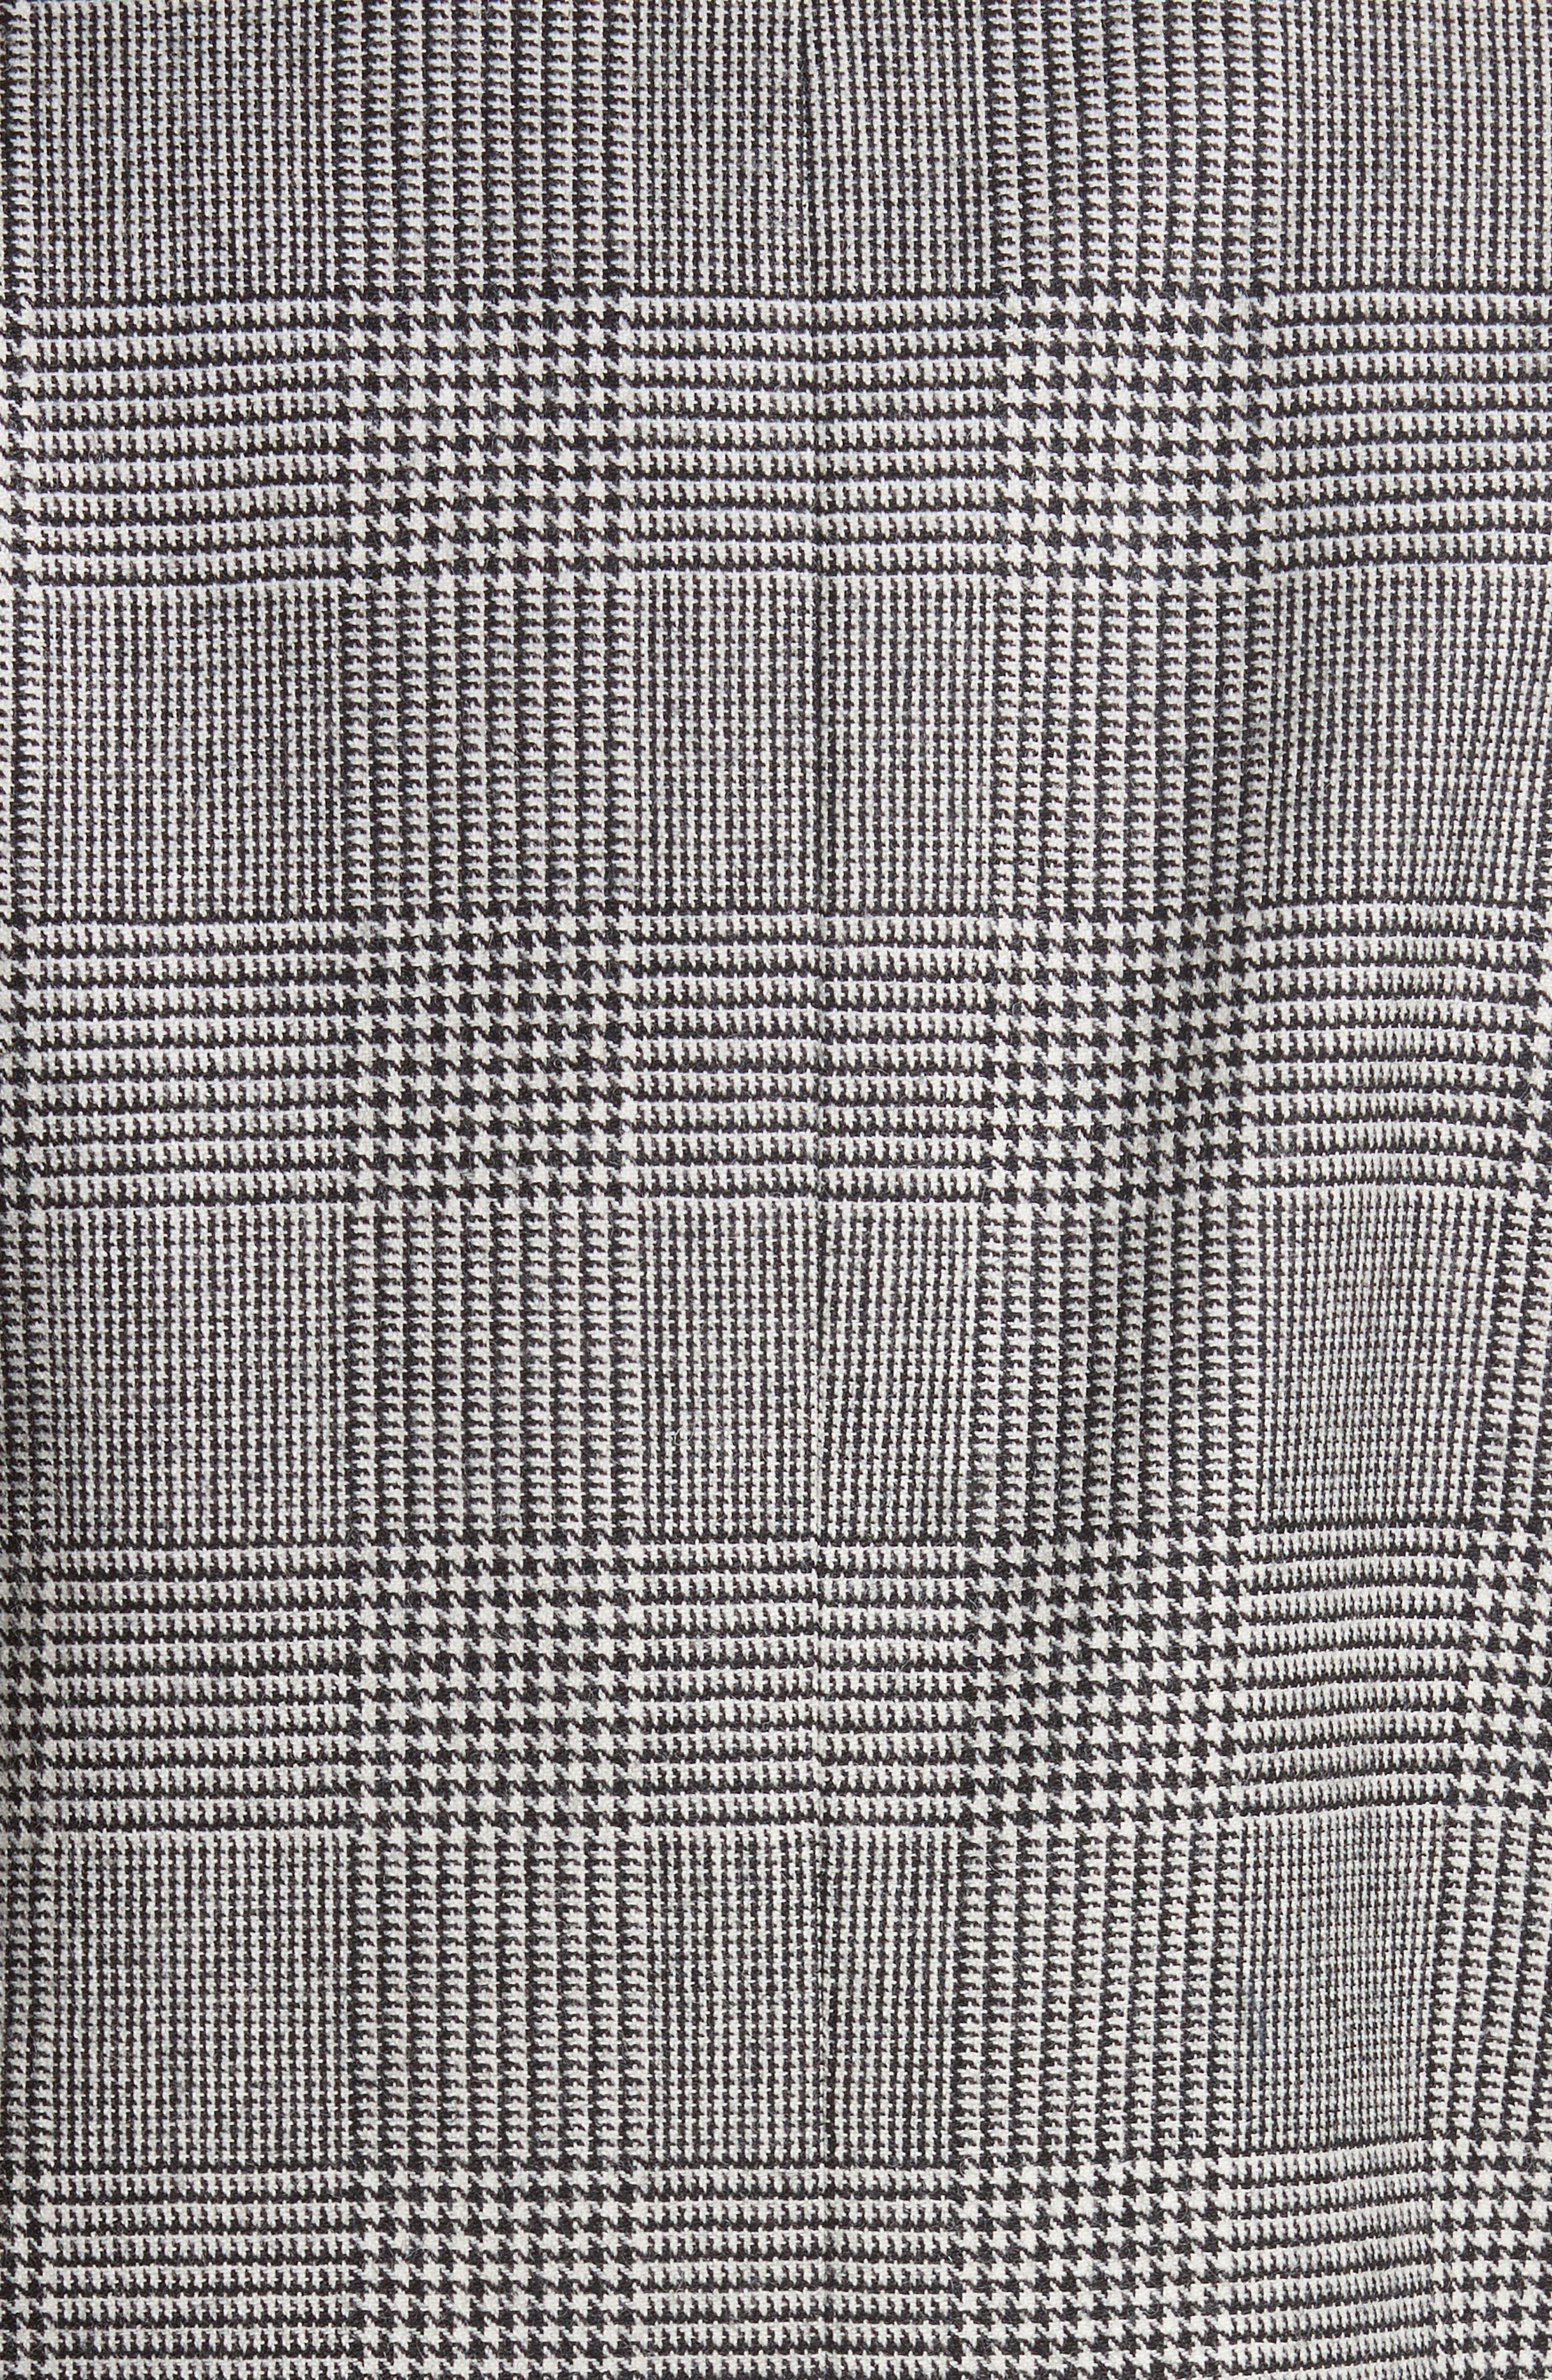 Glen Plaid Crop Jacket,                             Alternate thumbnail 7, color,                             Black/ White